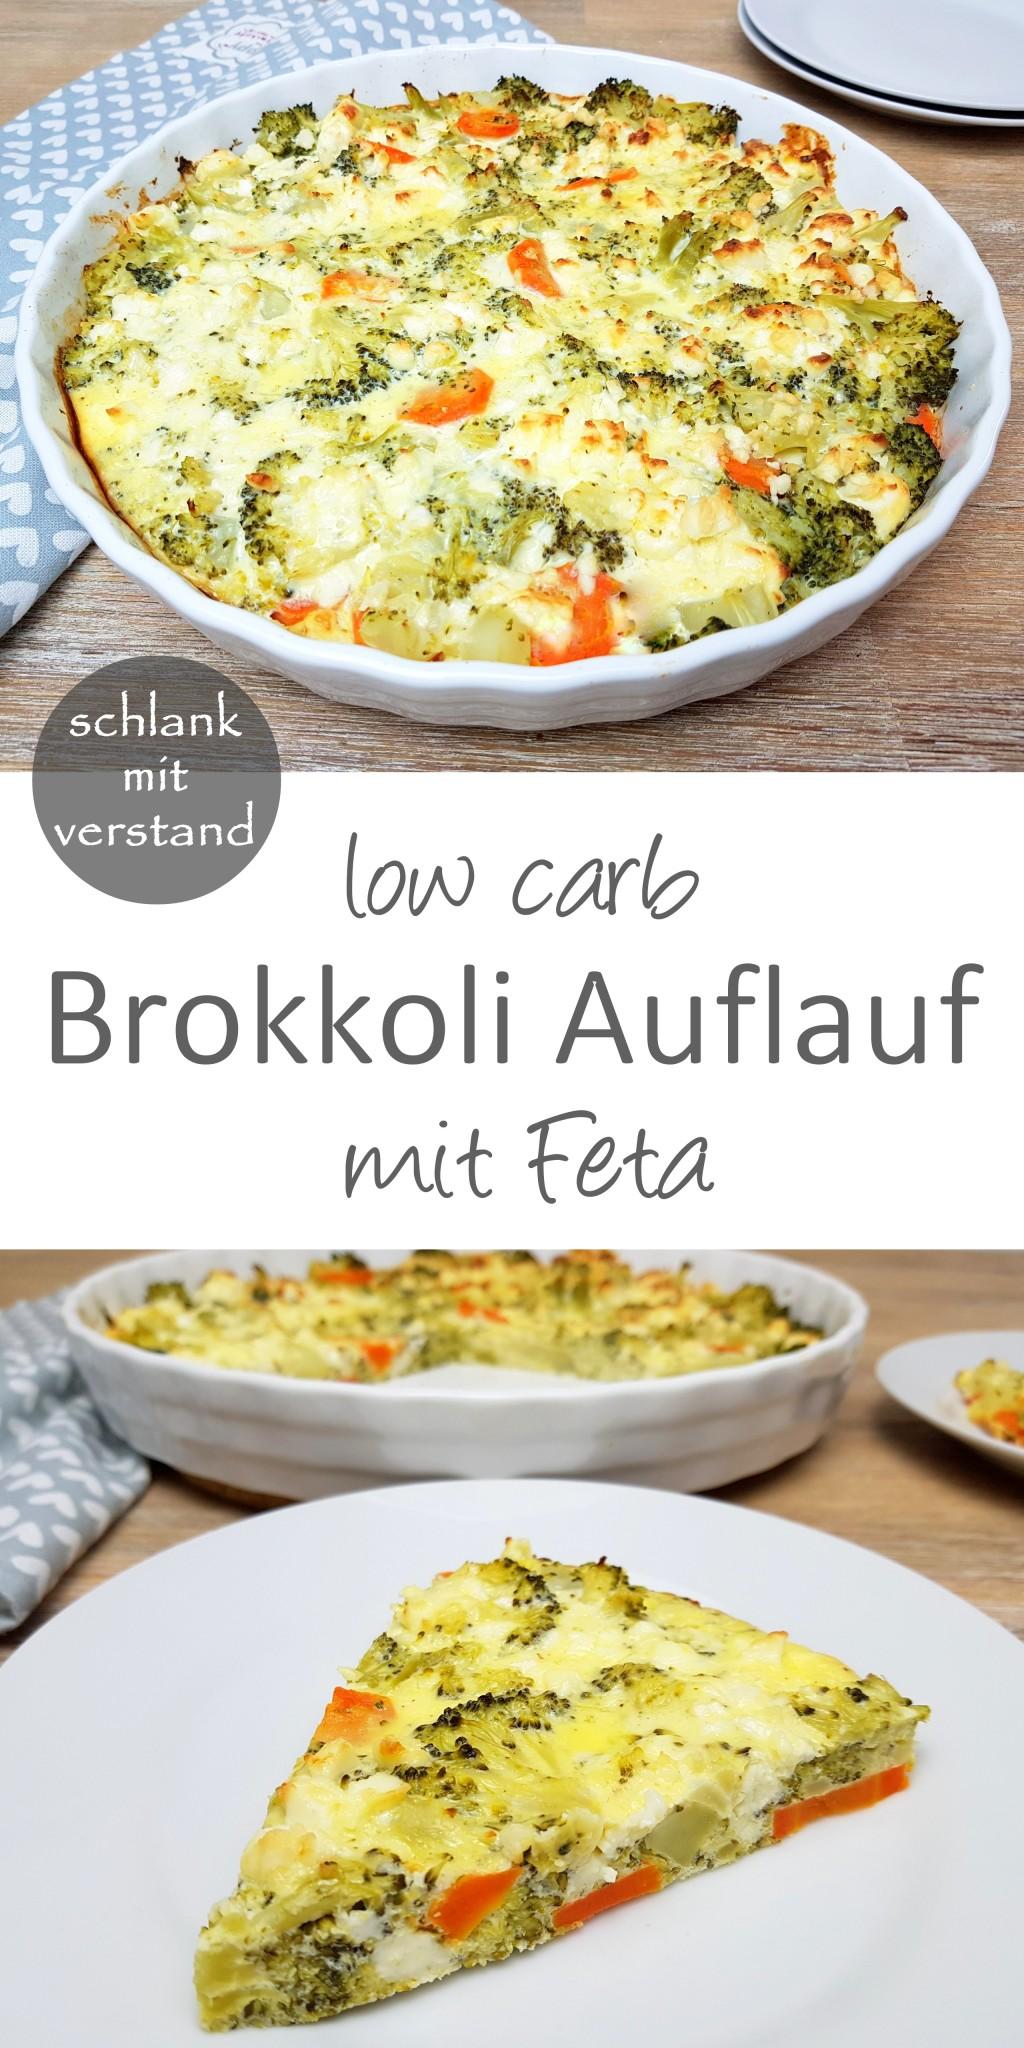 Brokkoli Auflauf low carb